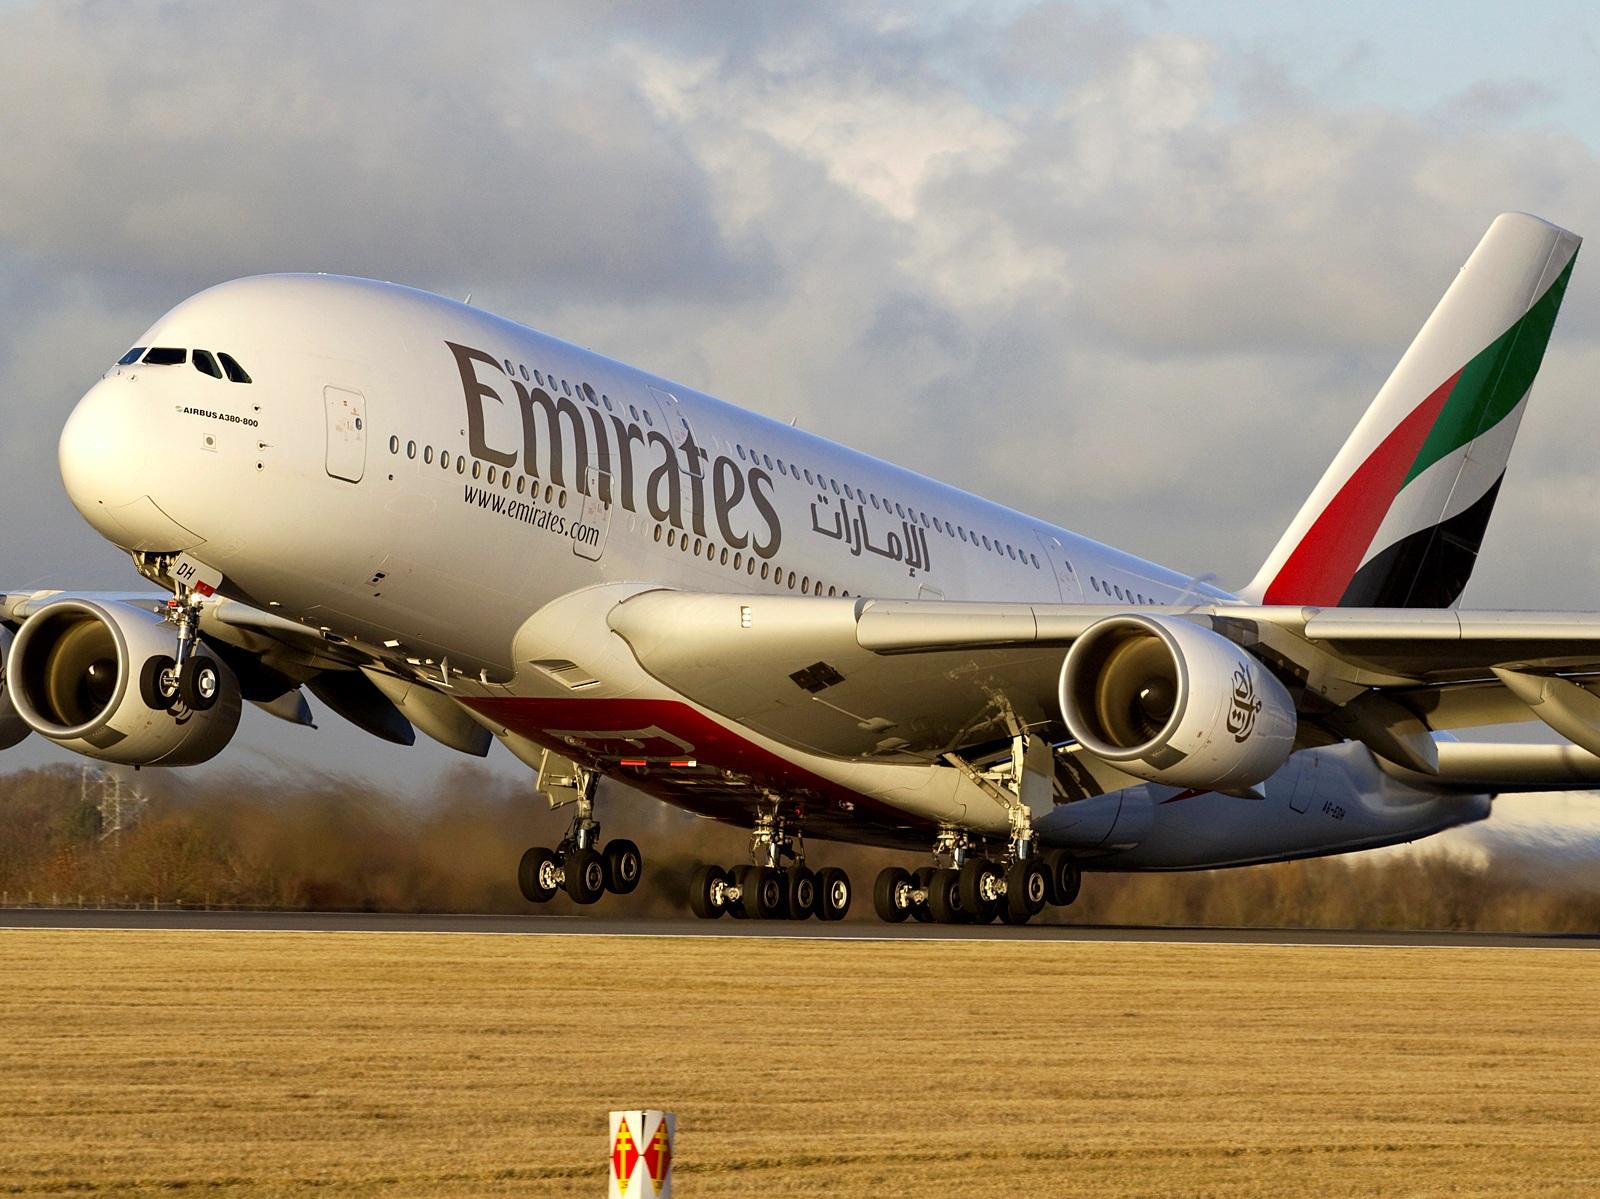 Airbus A380 Emirates Takeoff Leaving Runway Aircraft Wallpaper 1600x1199